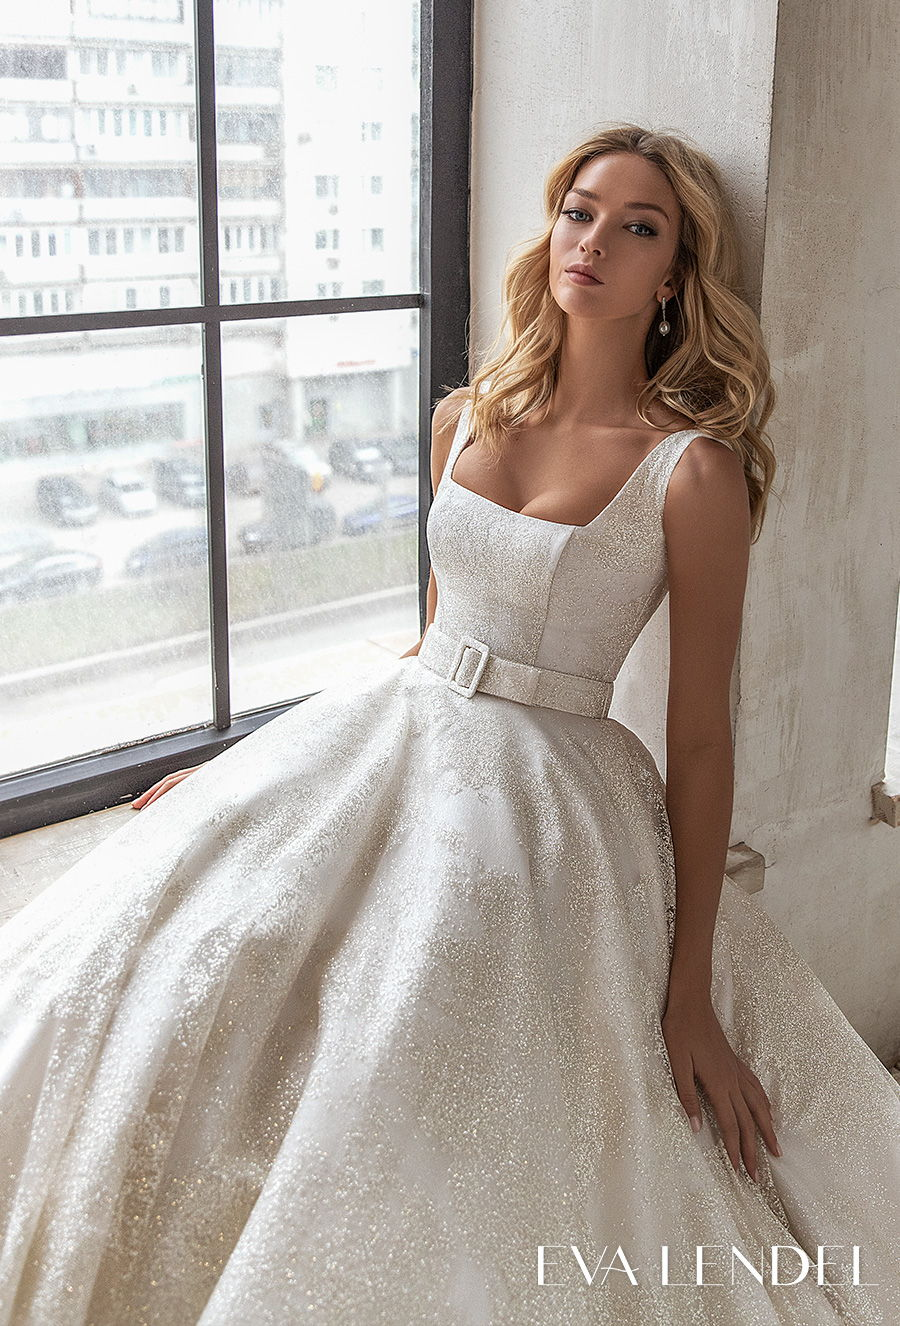 eva lendel 2021 bridal sleeveless square neckline light embellishment romantic elegant a line wedding dress square back chapel train (brie) zv